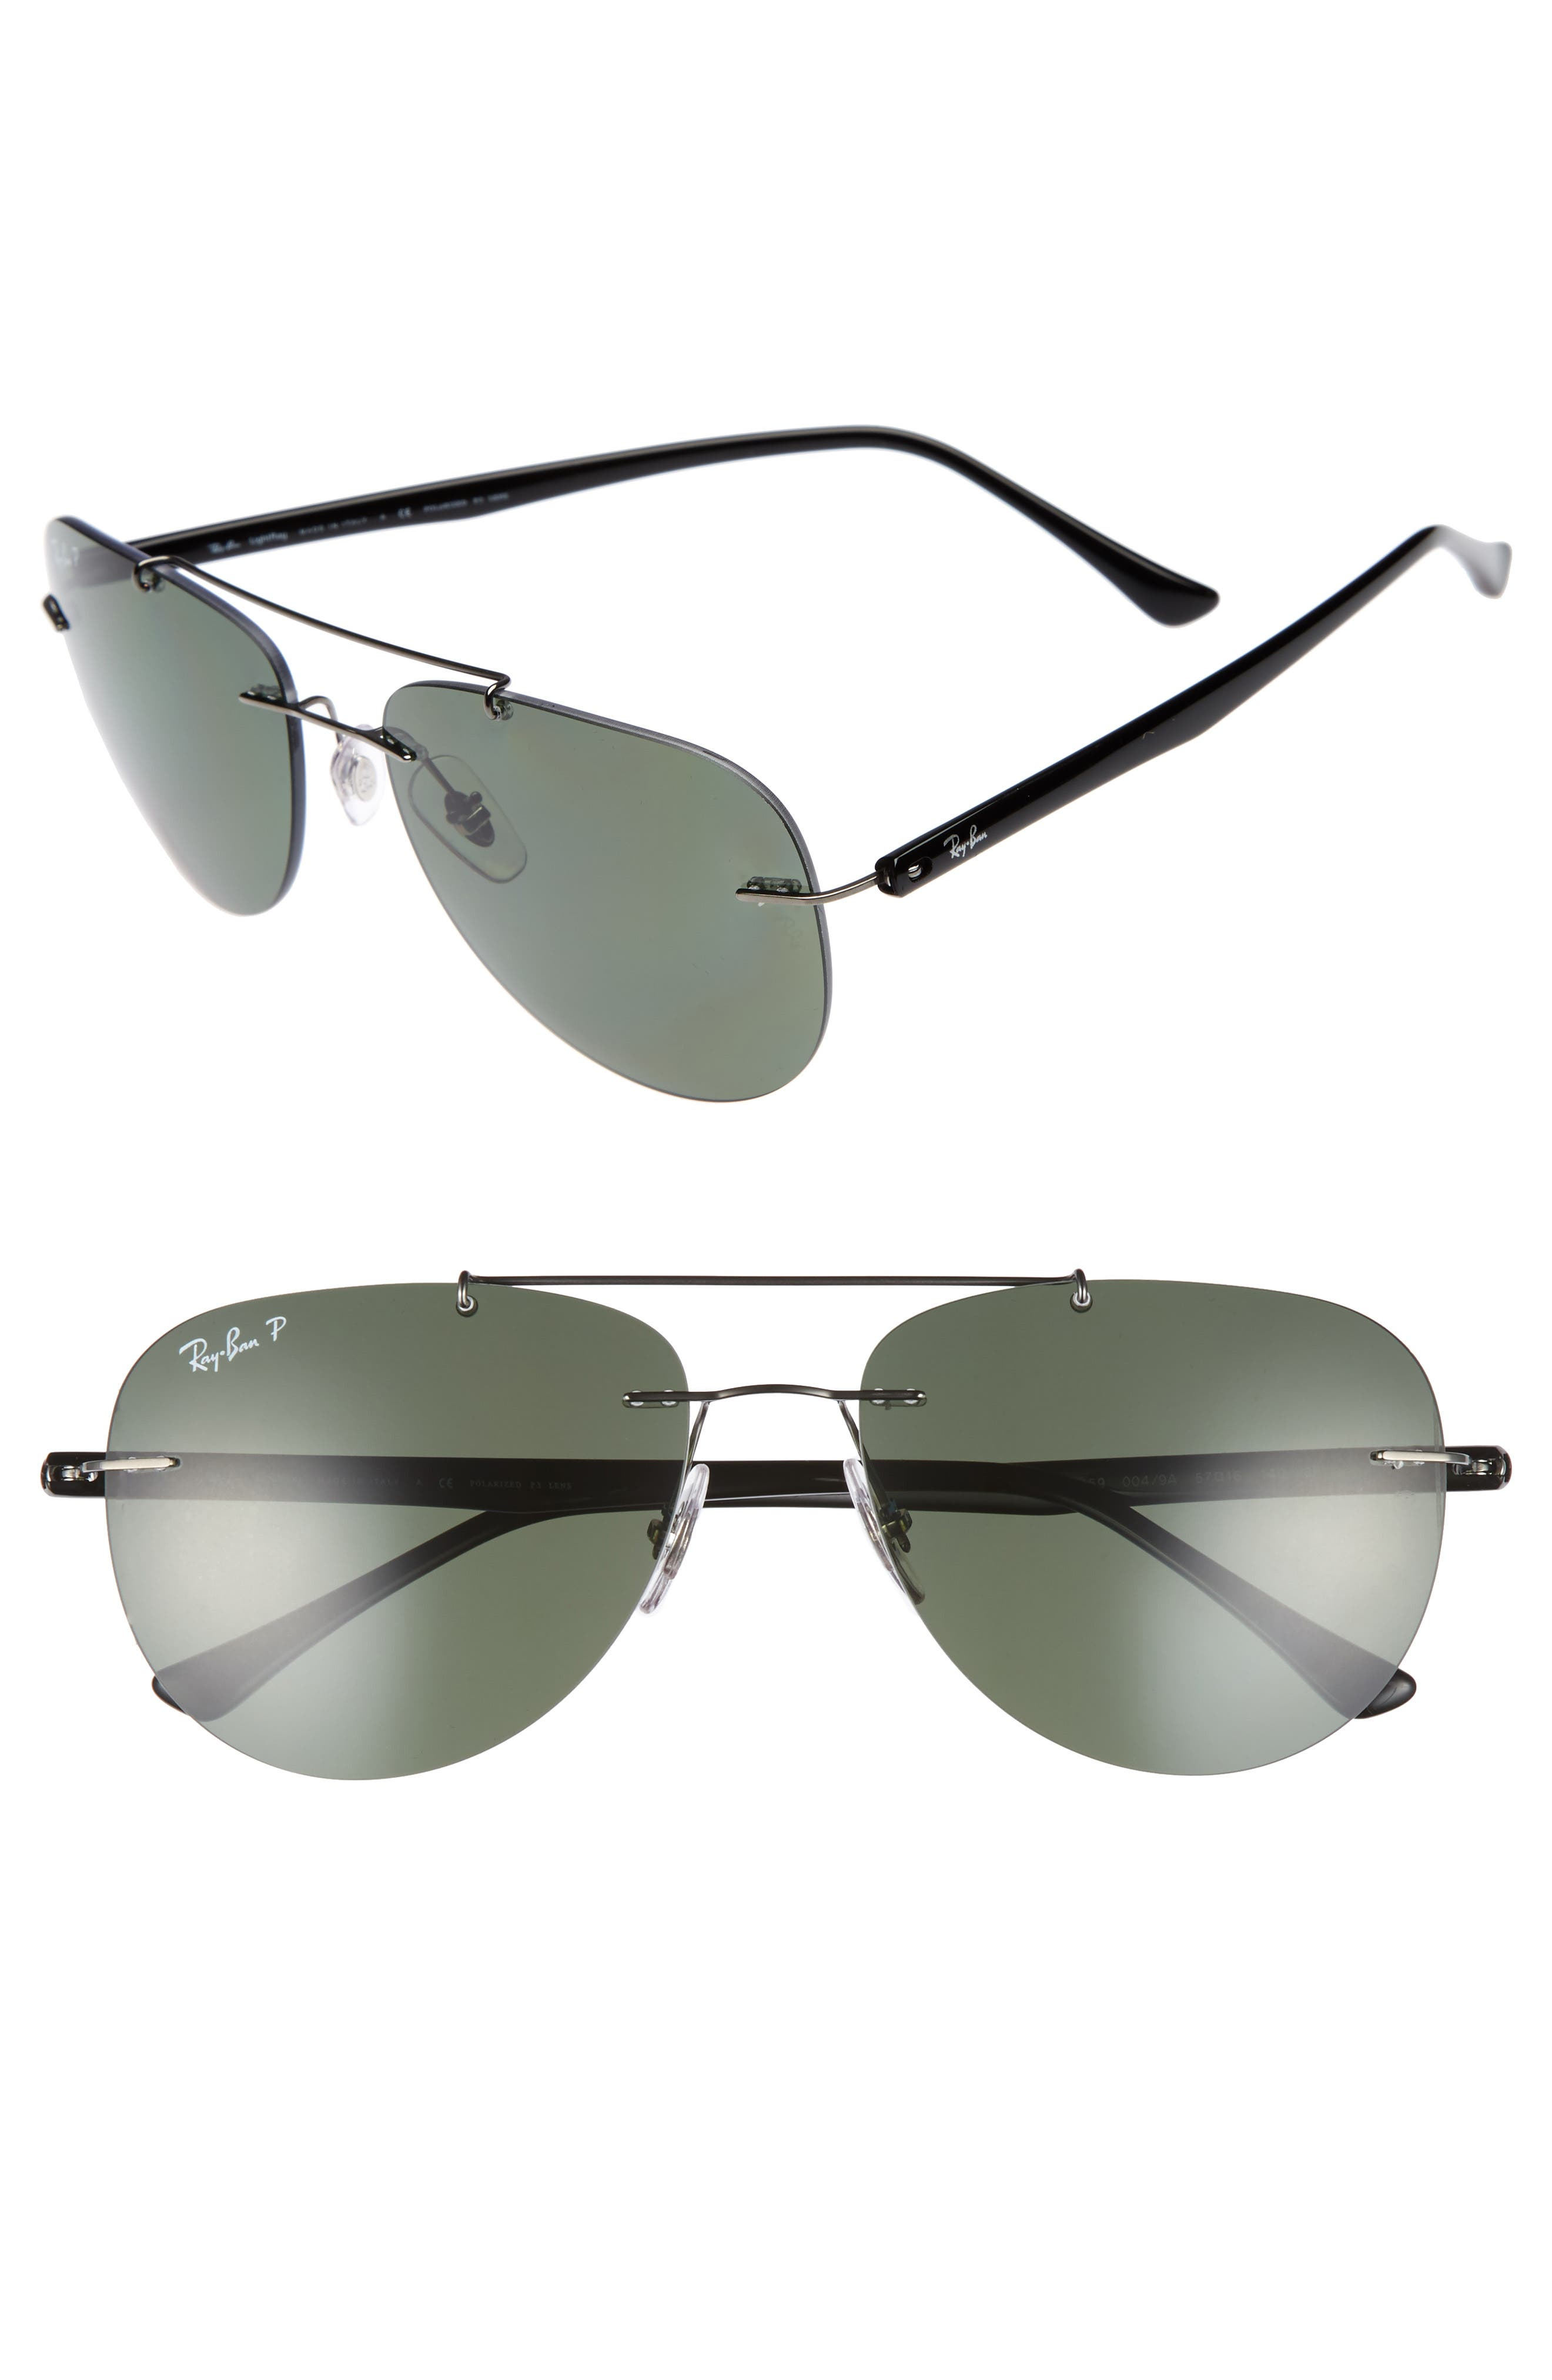 Main Image - Ray-Ban Phantos 57mm Polarized Rimless Aviator Sunglasses